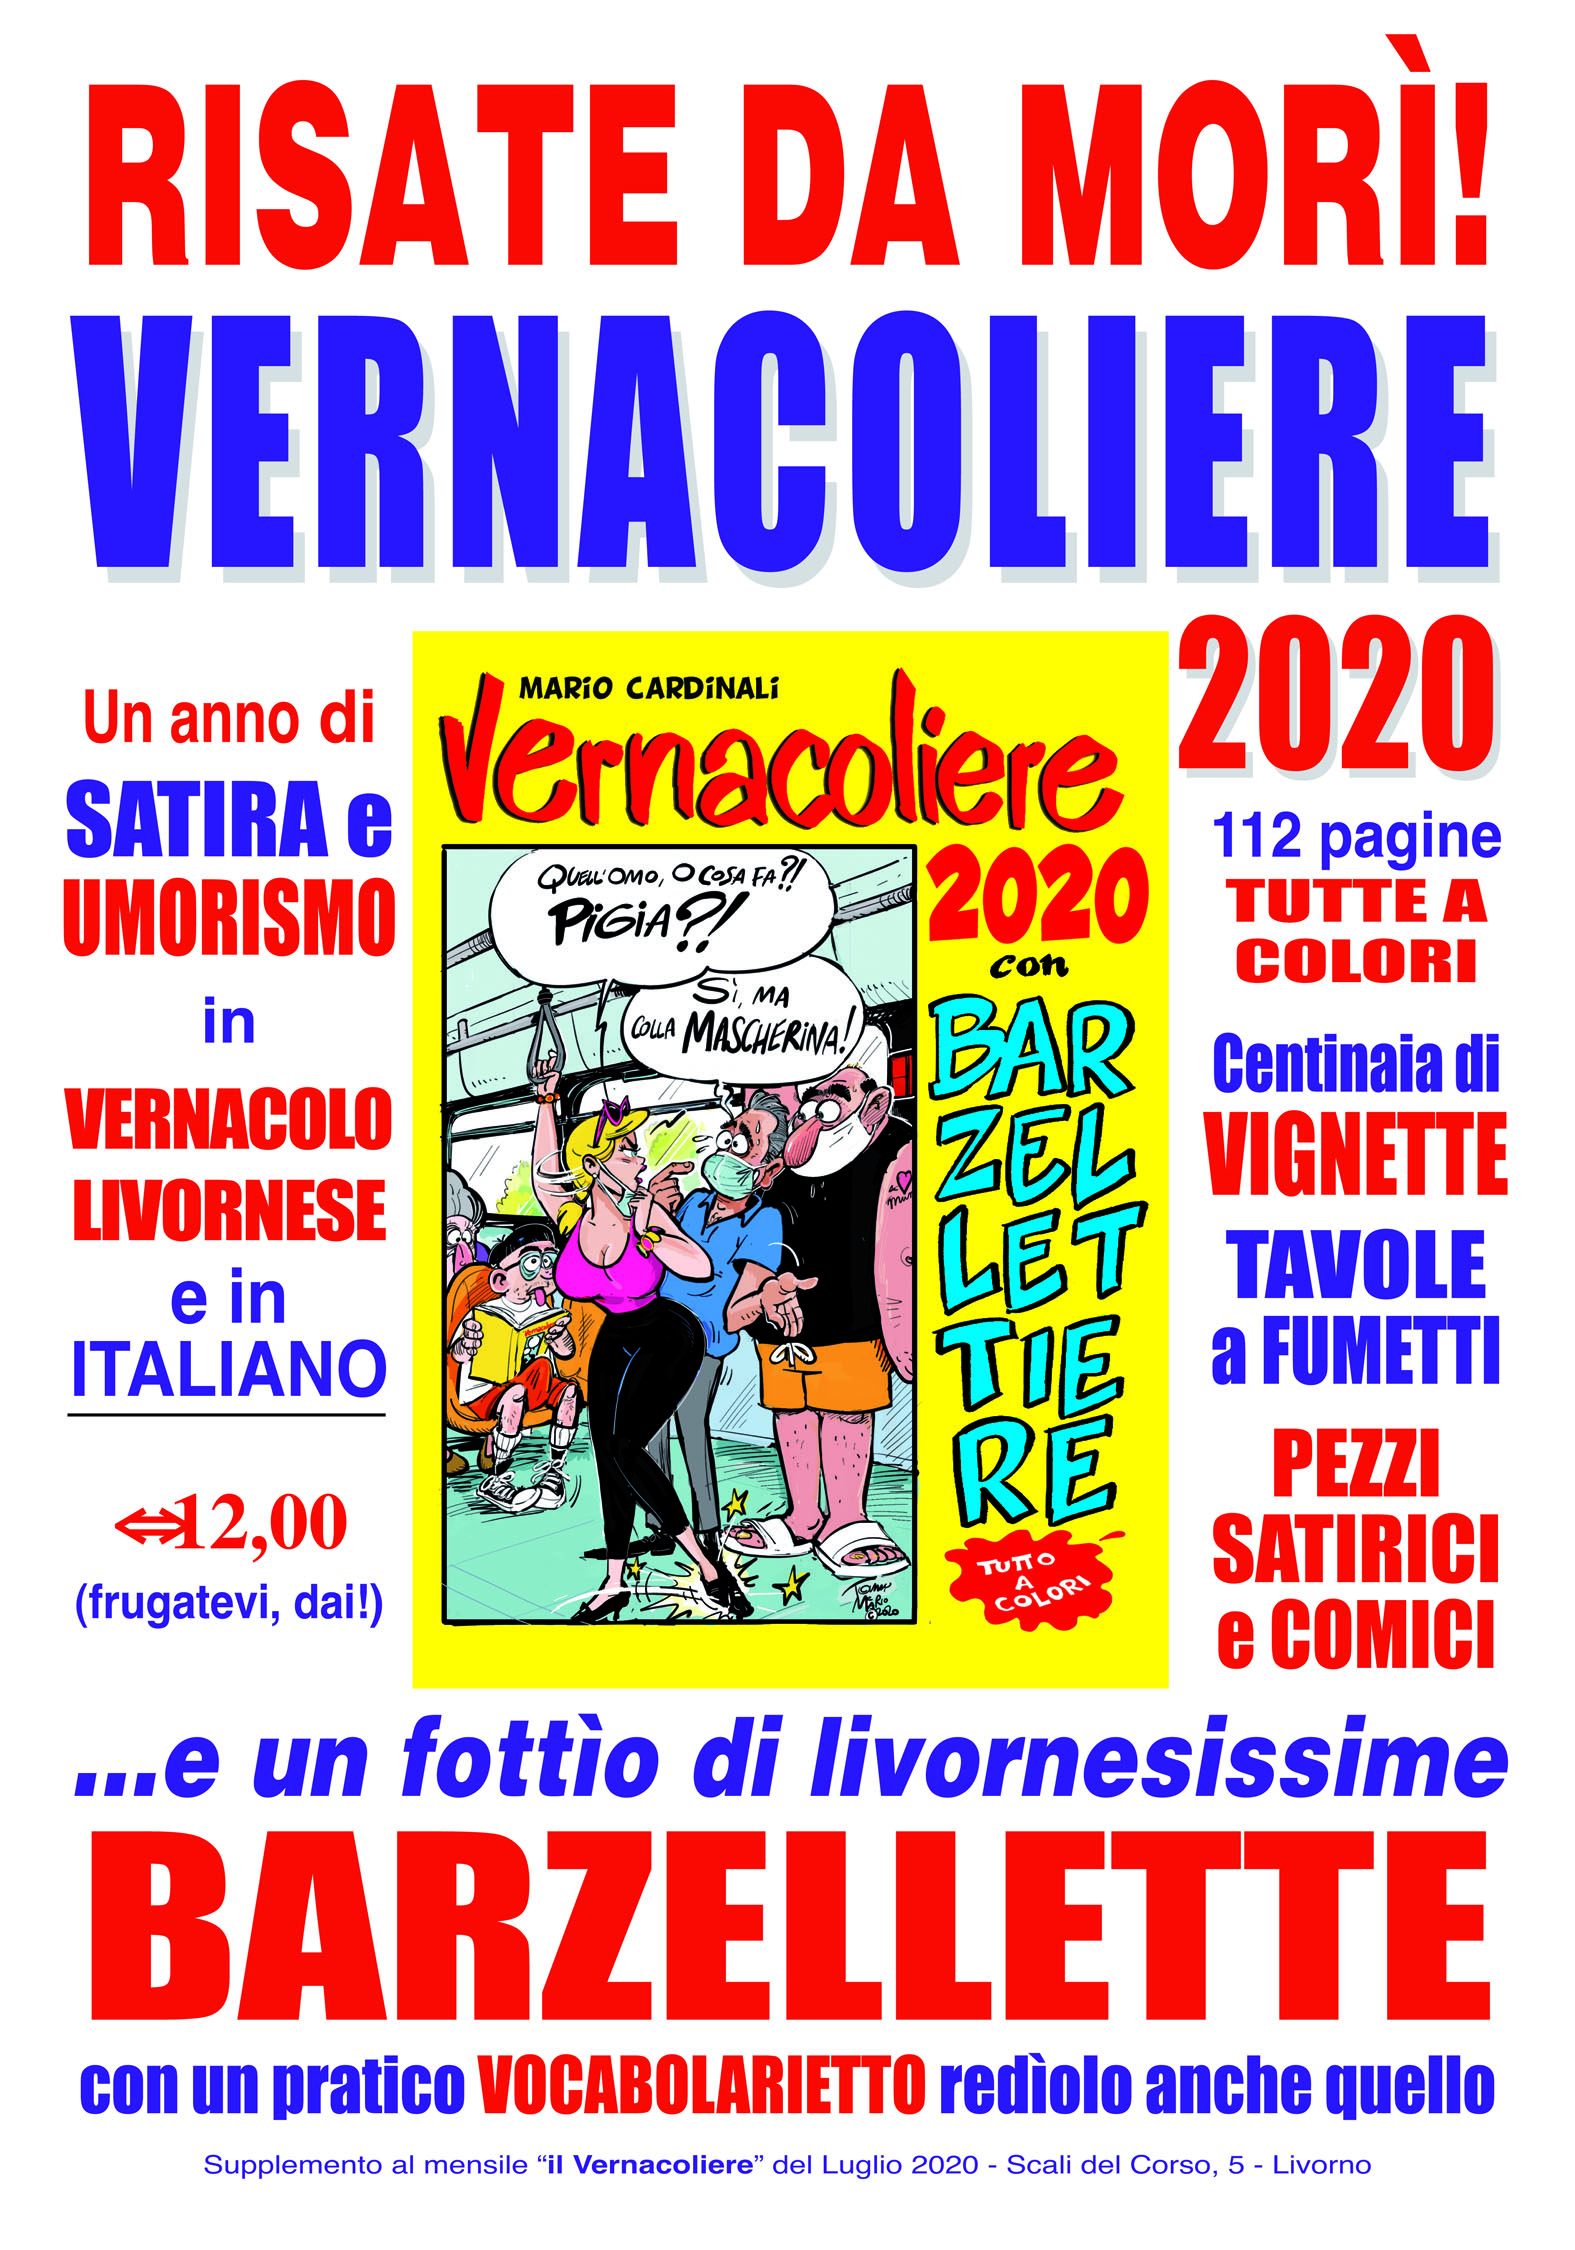 Vernacoliere 2020